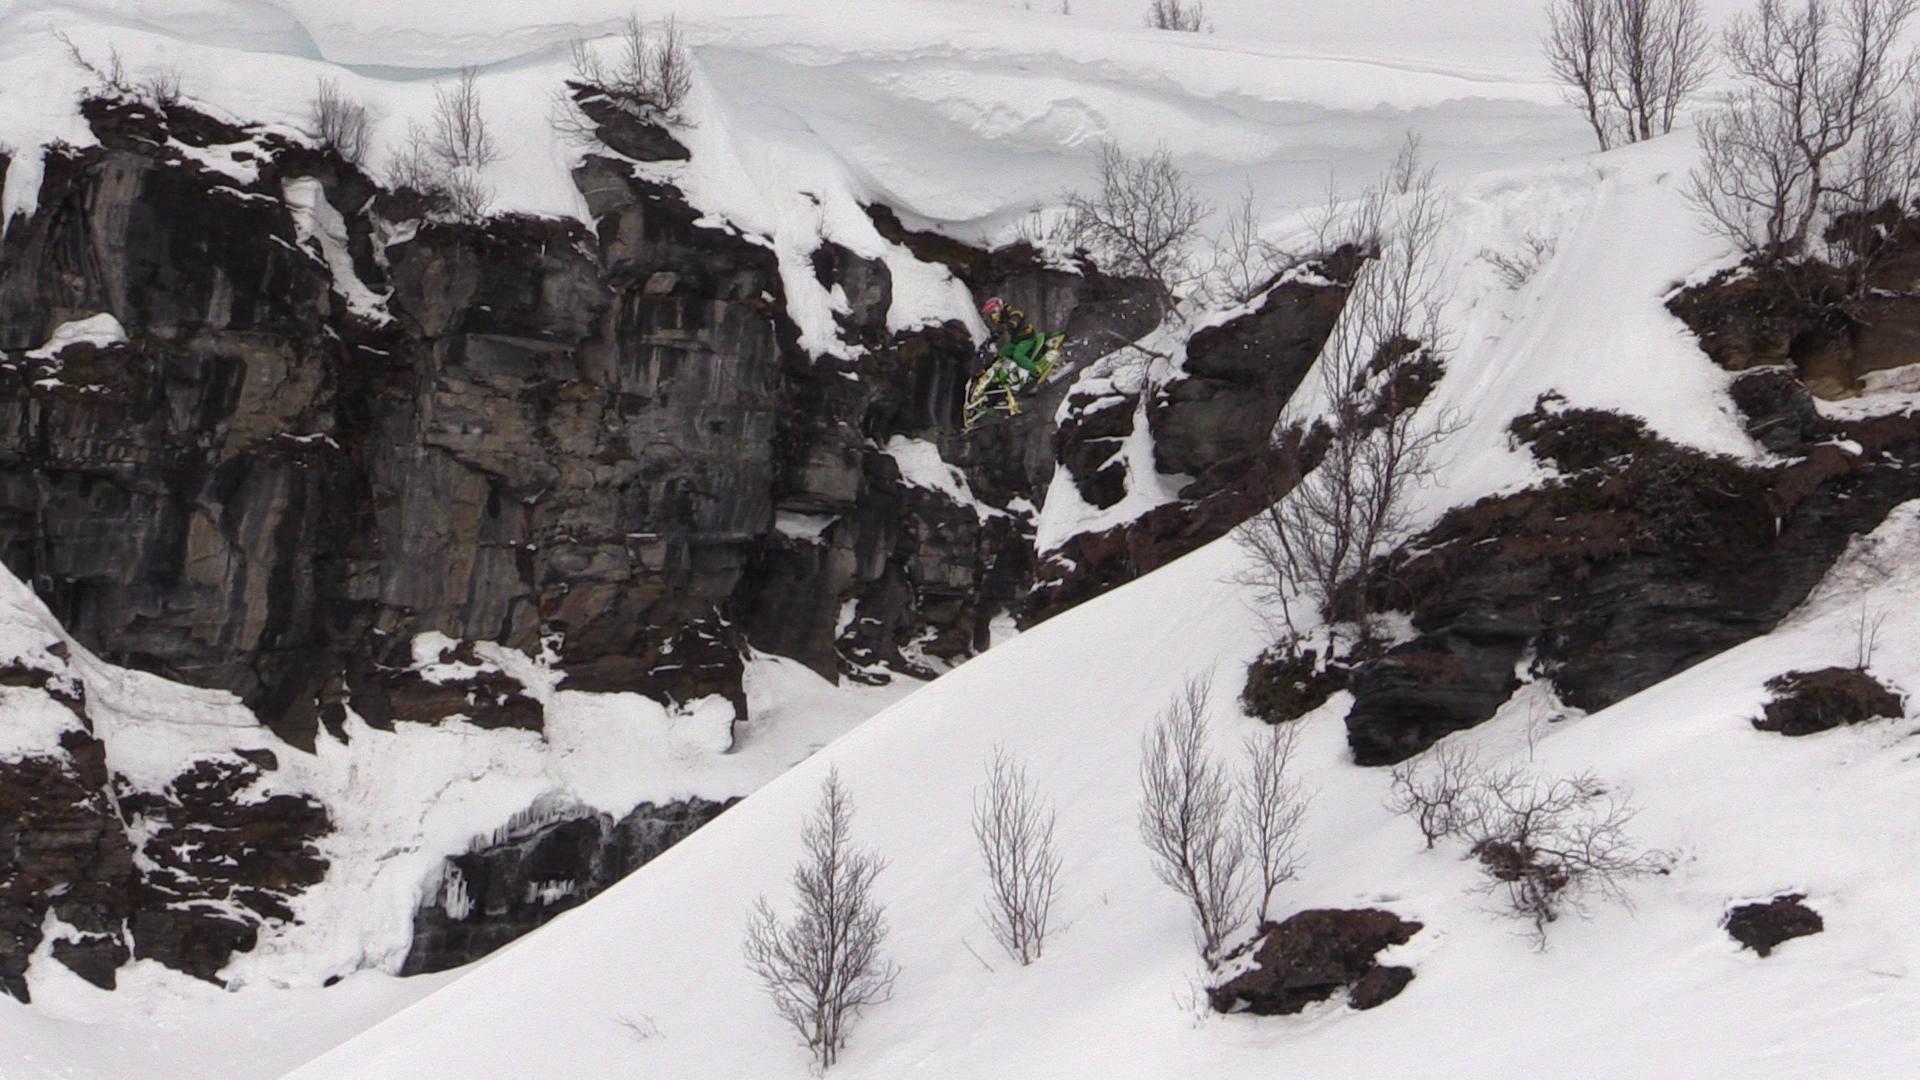 Snowmobiling Sweden Terrain